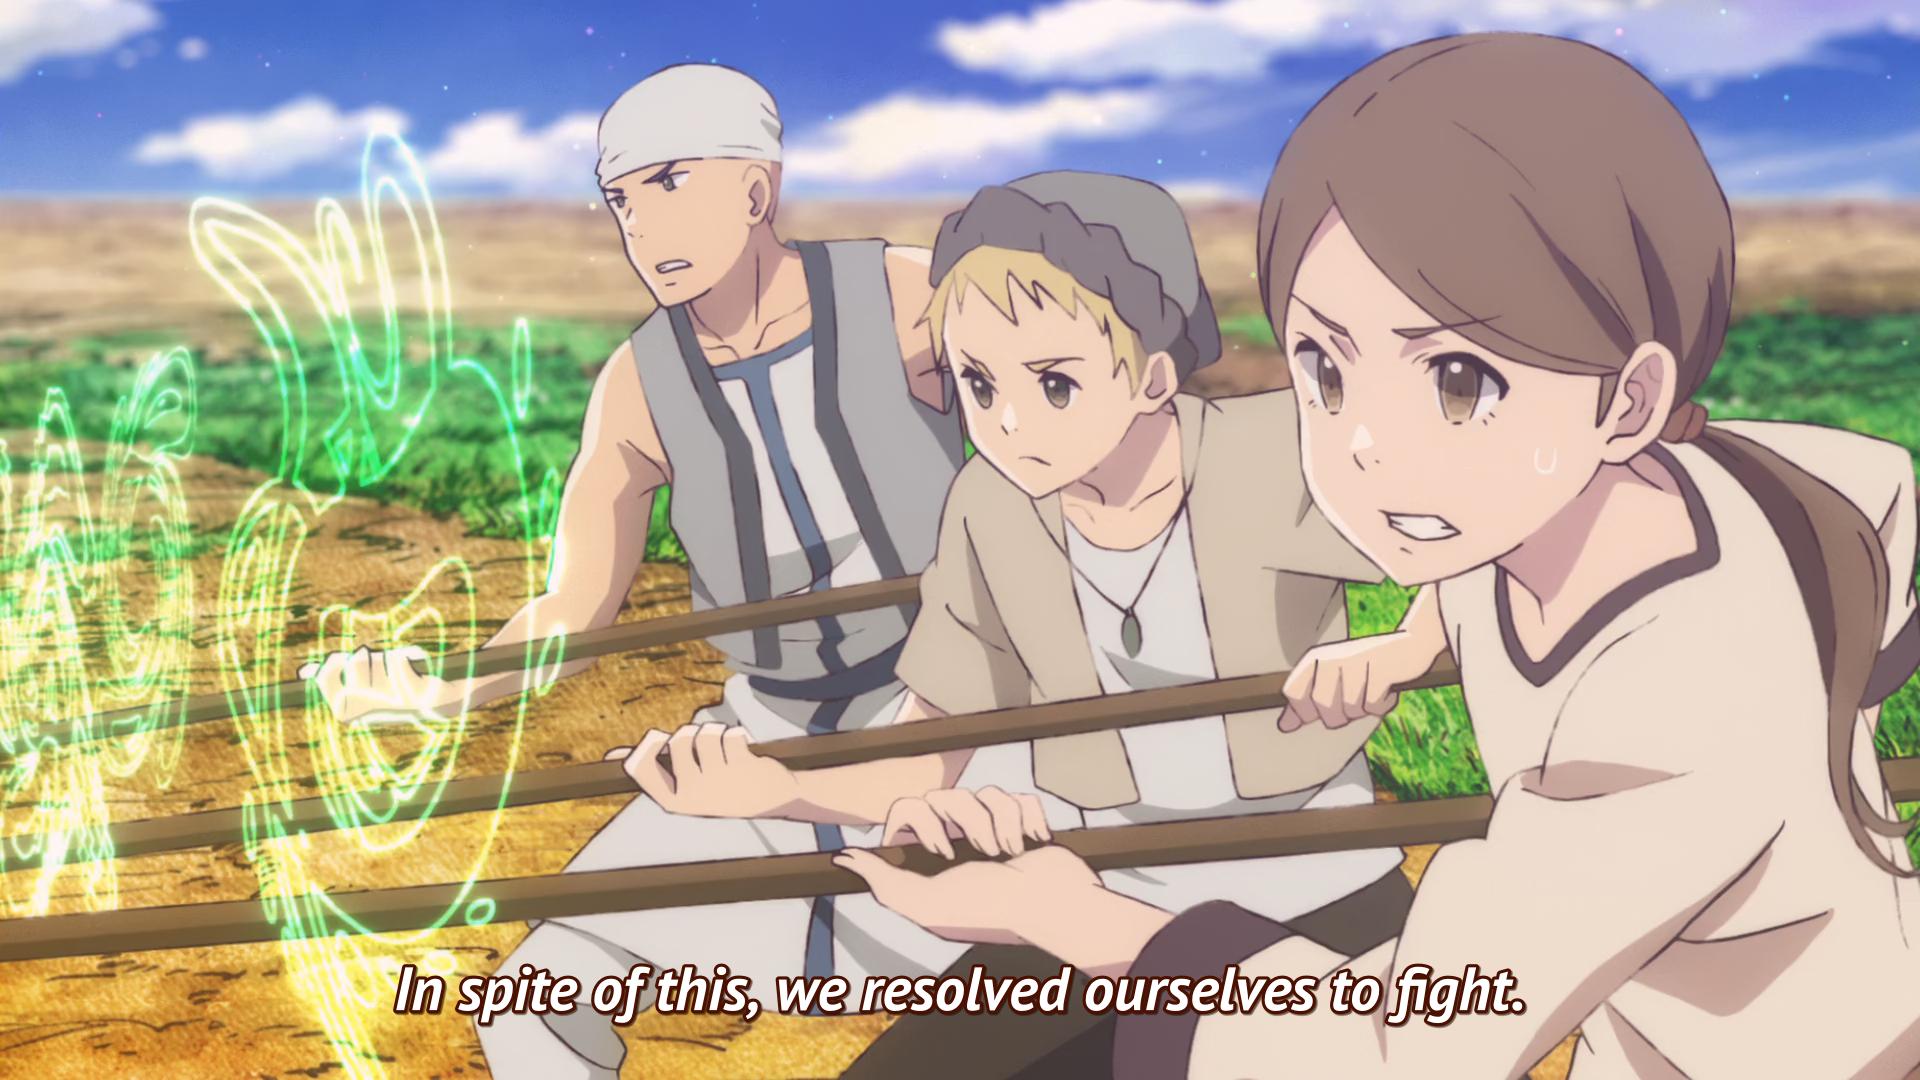 Anime Wallpaper Axe Ouni Children Of The Whales Wallpaper